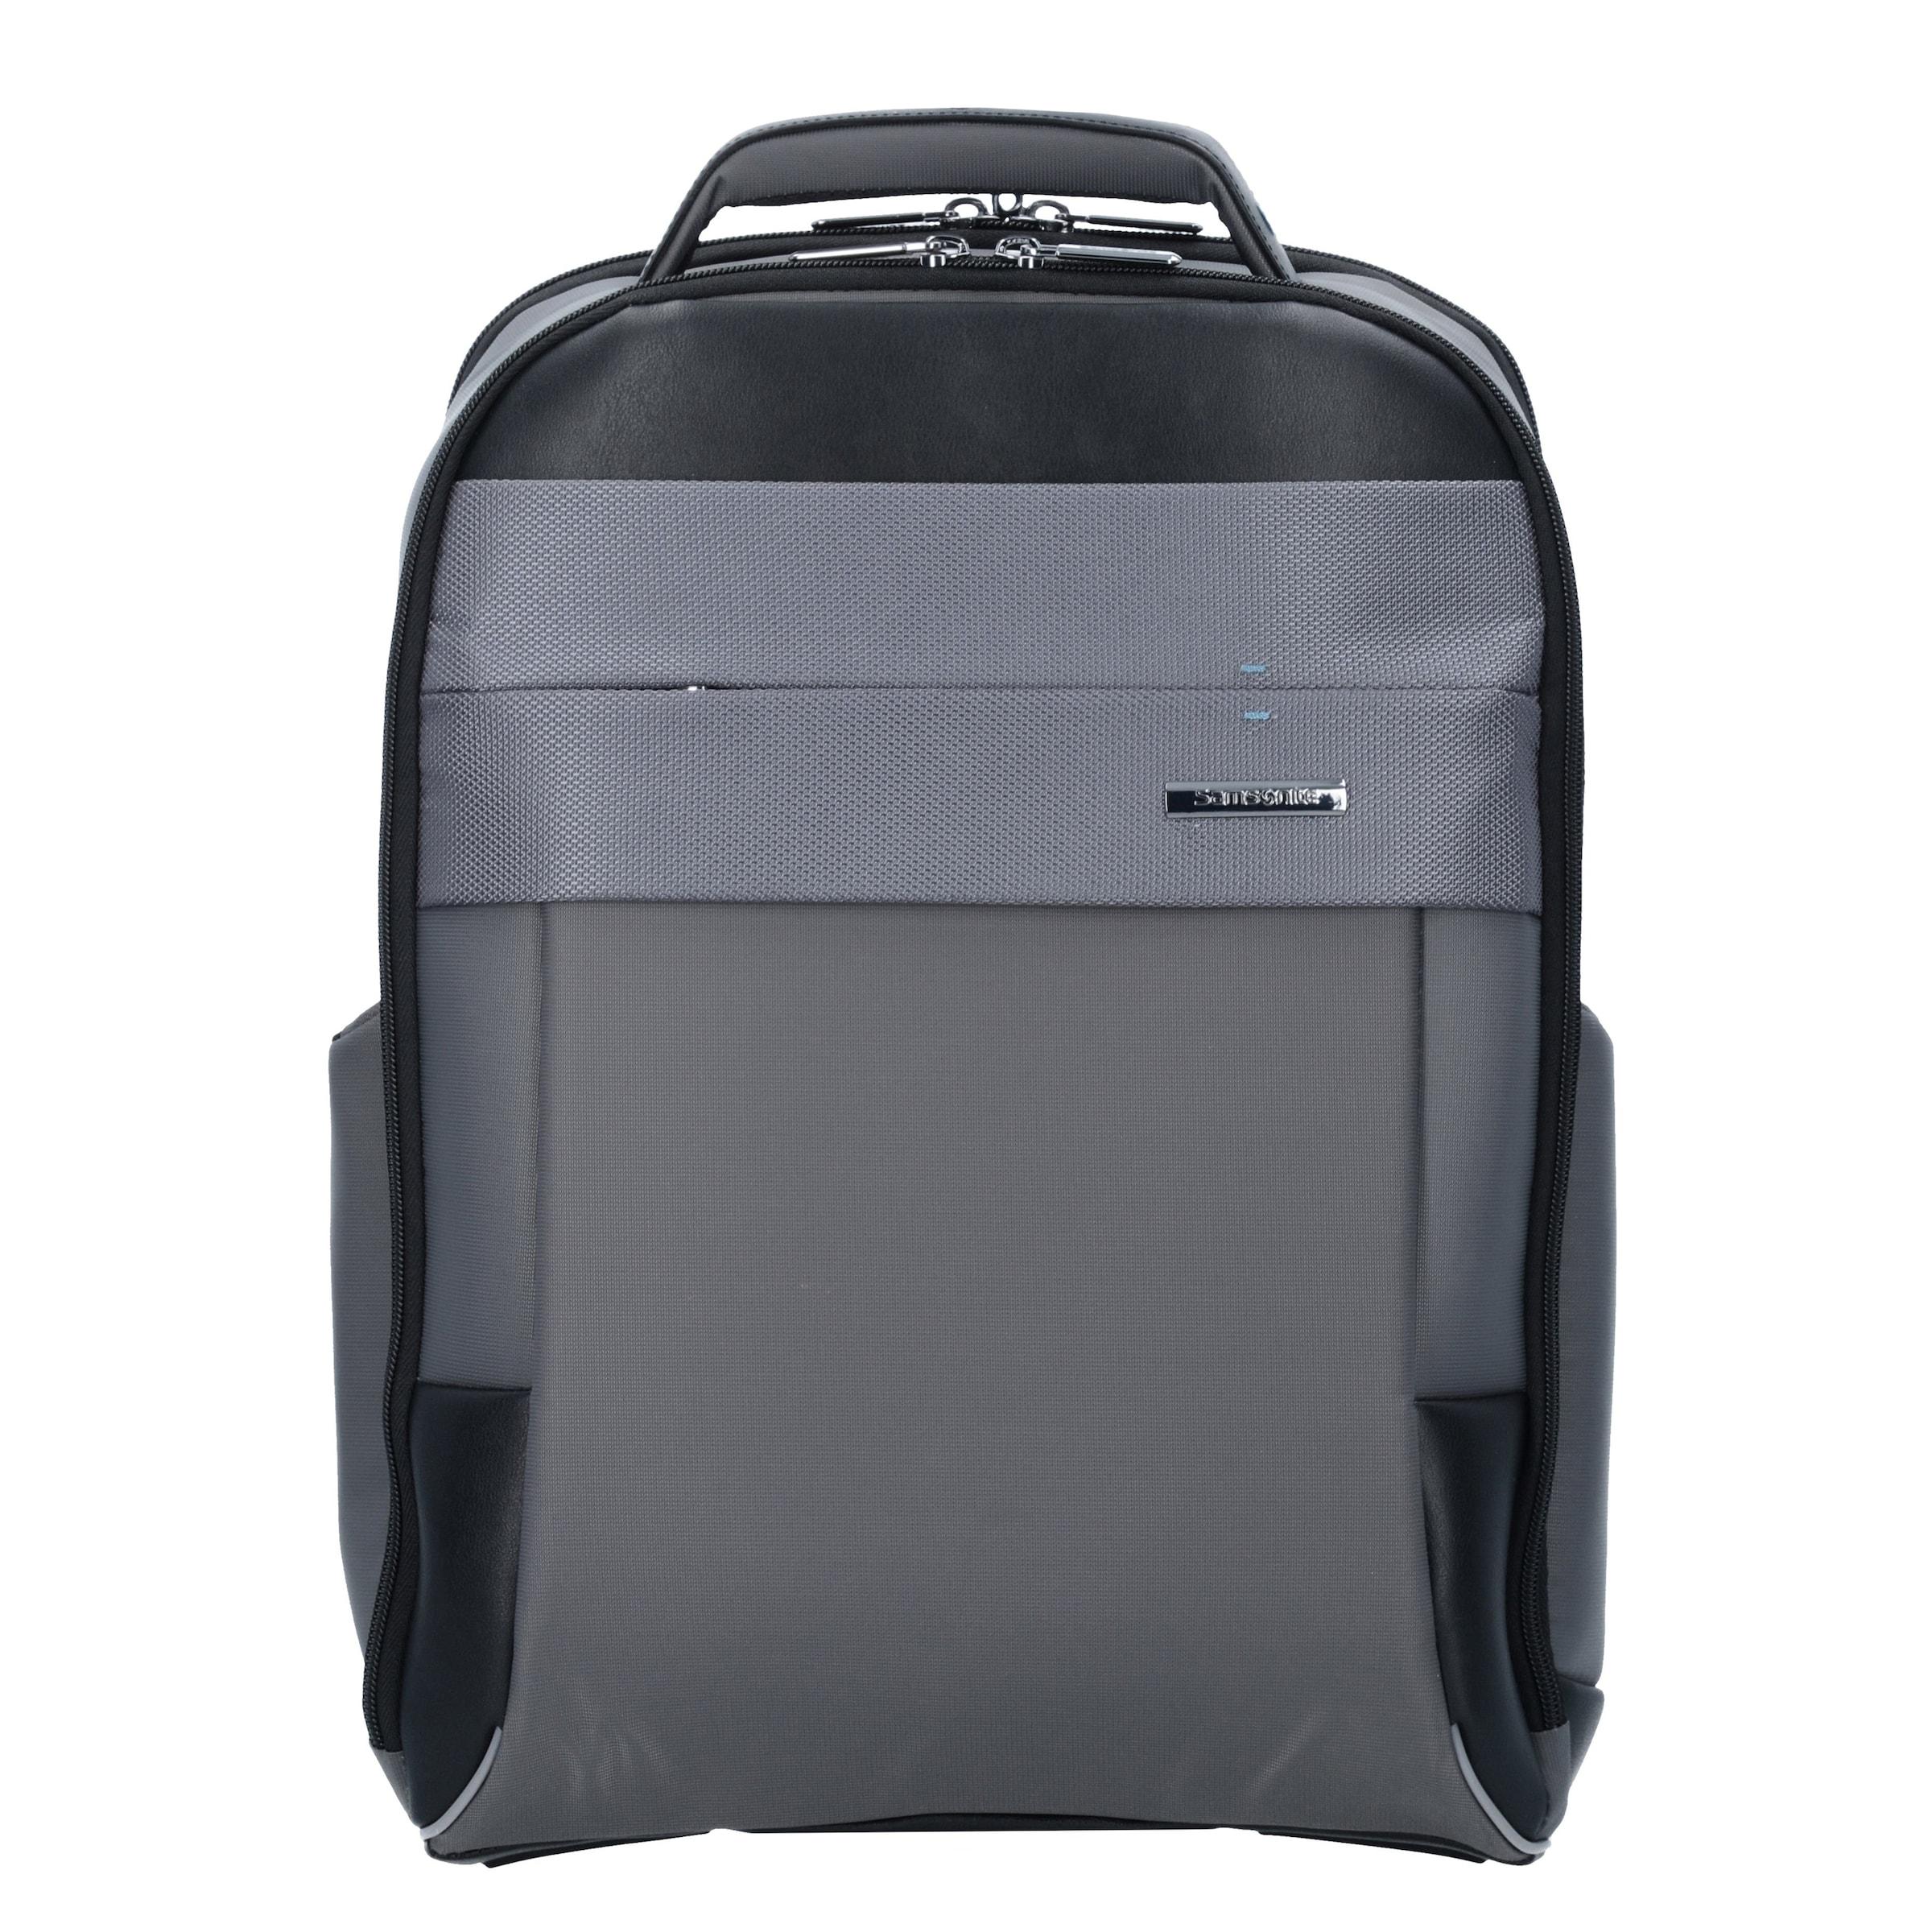 TaubenblauGrau Spectrolite Business Laptopfach Samsonite Rucksack Cm In Schwarz 0 40 2 qpUMGVLSz